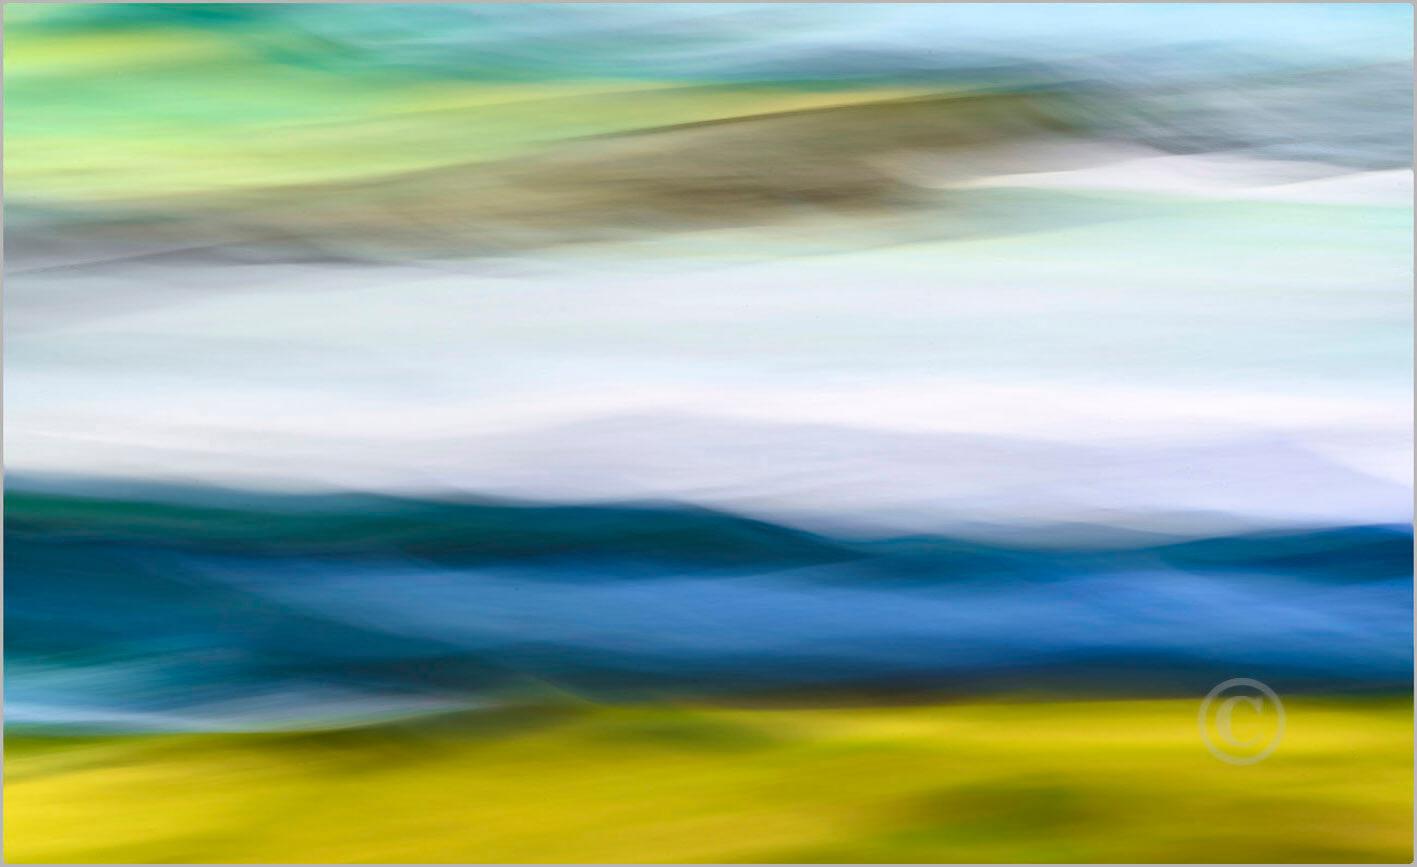 Landscape_7N2940_L